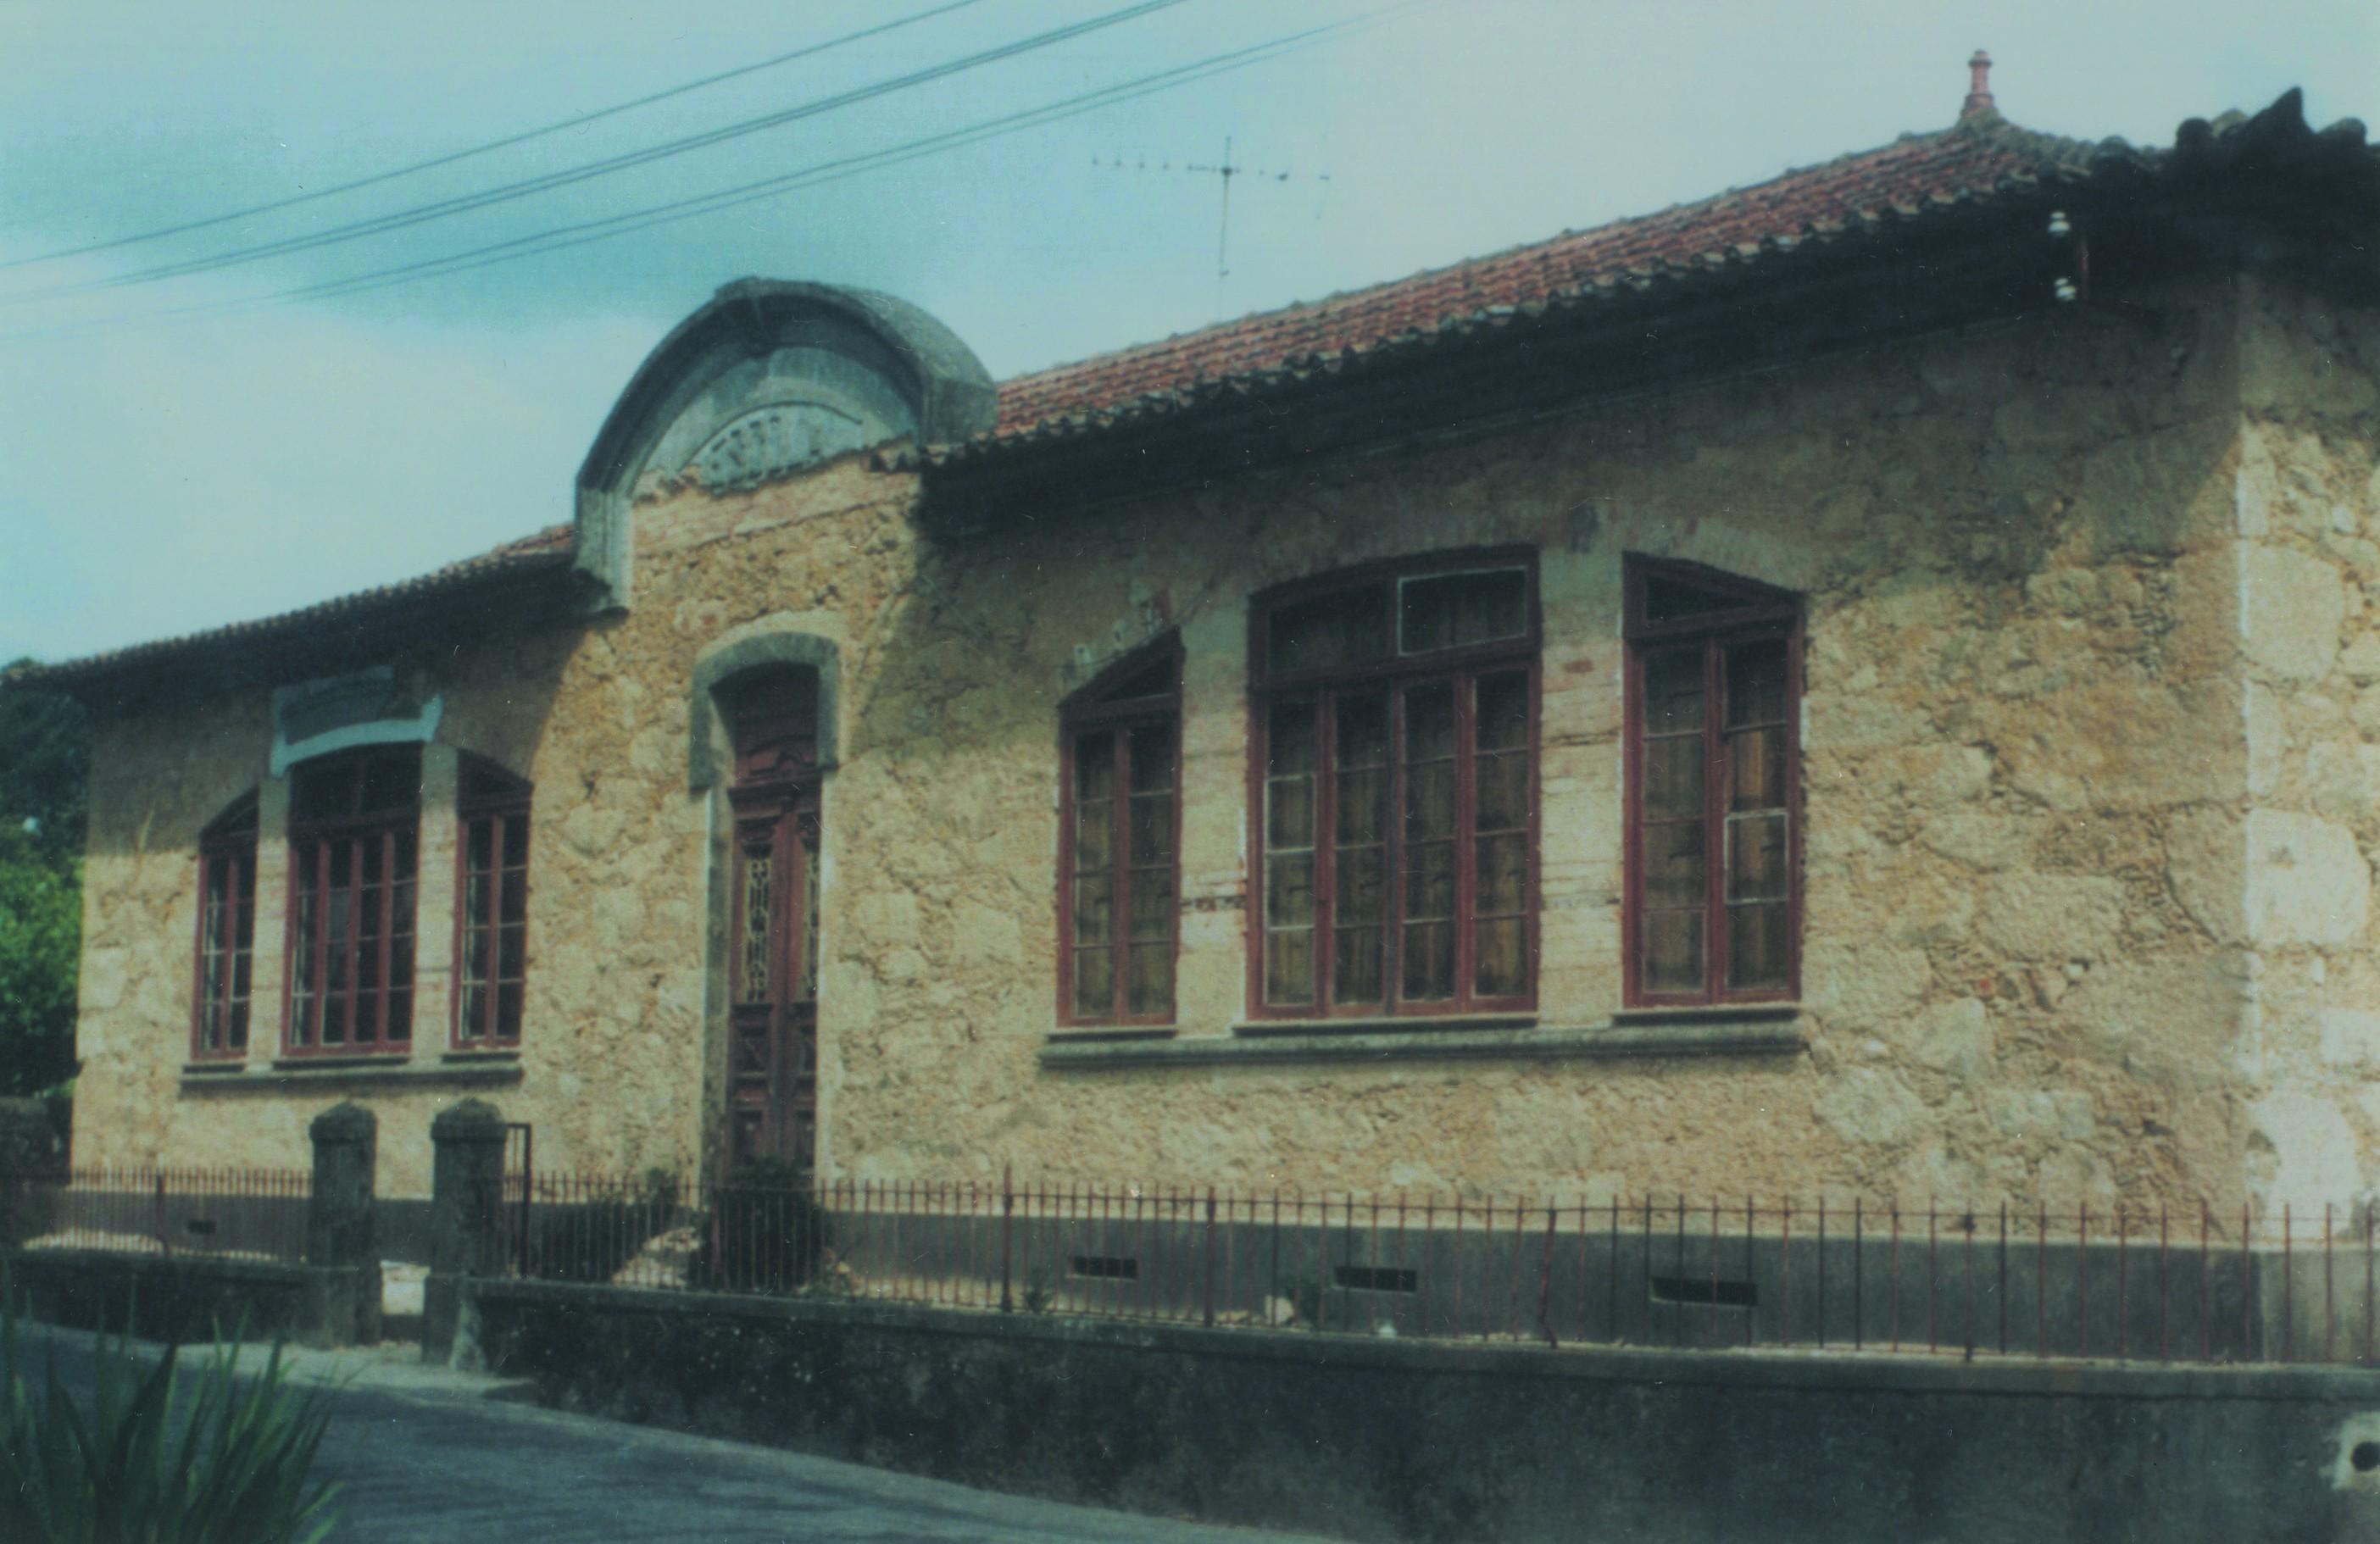 Escola velha de Lousada, Pindelo (Anos 90)